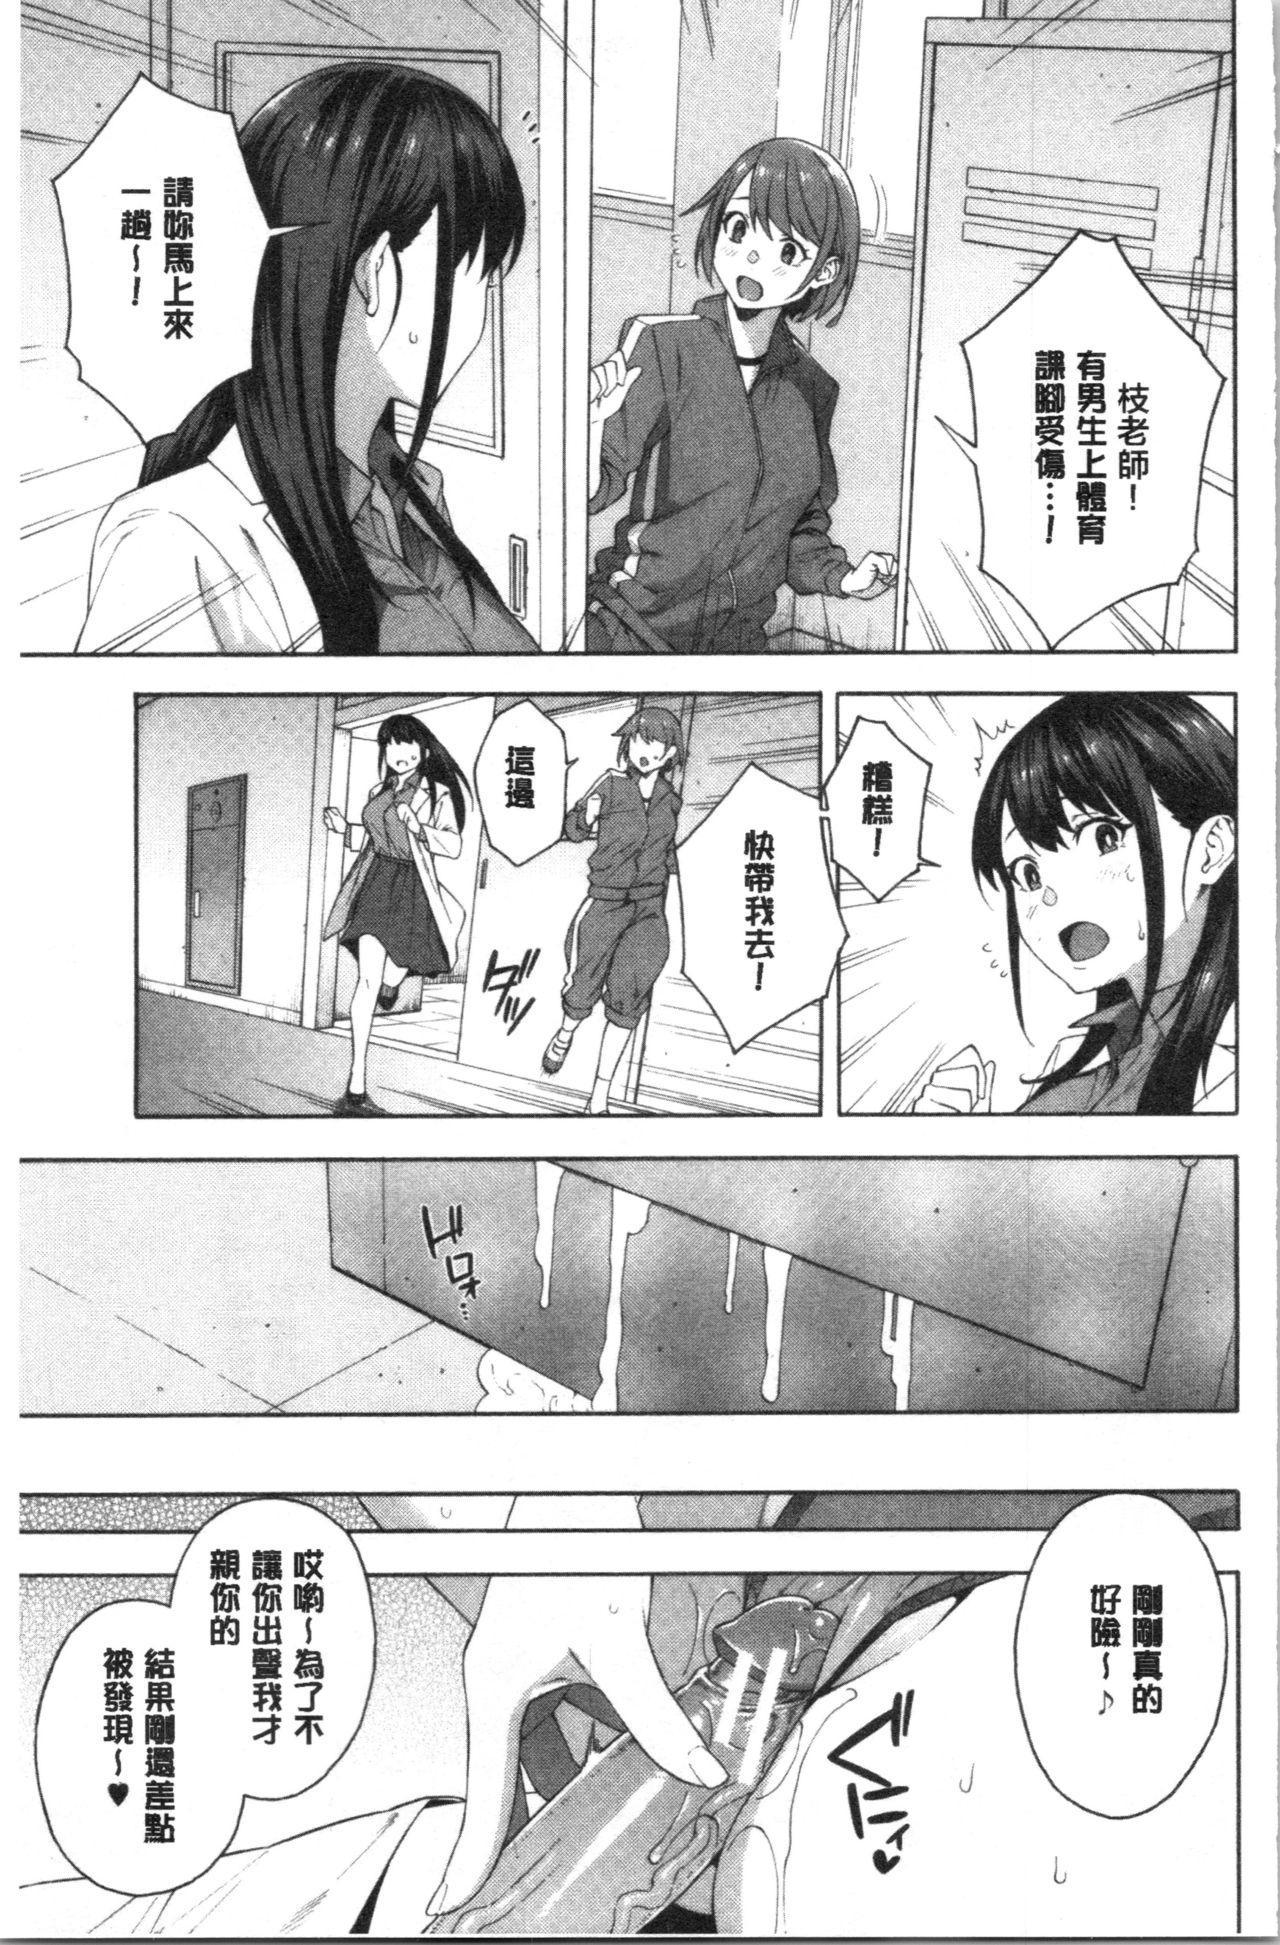 Okashite Ageru | 讓你來侵犯我 31